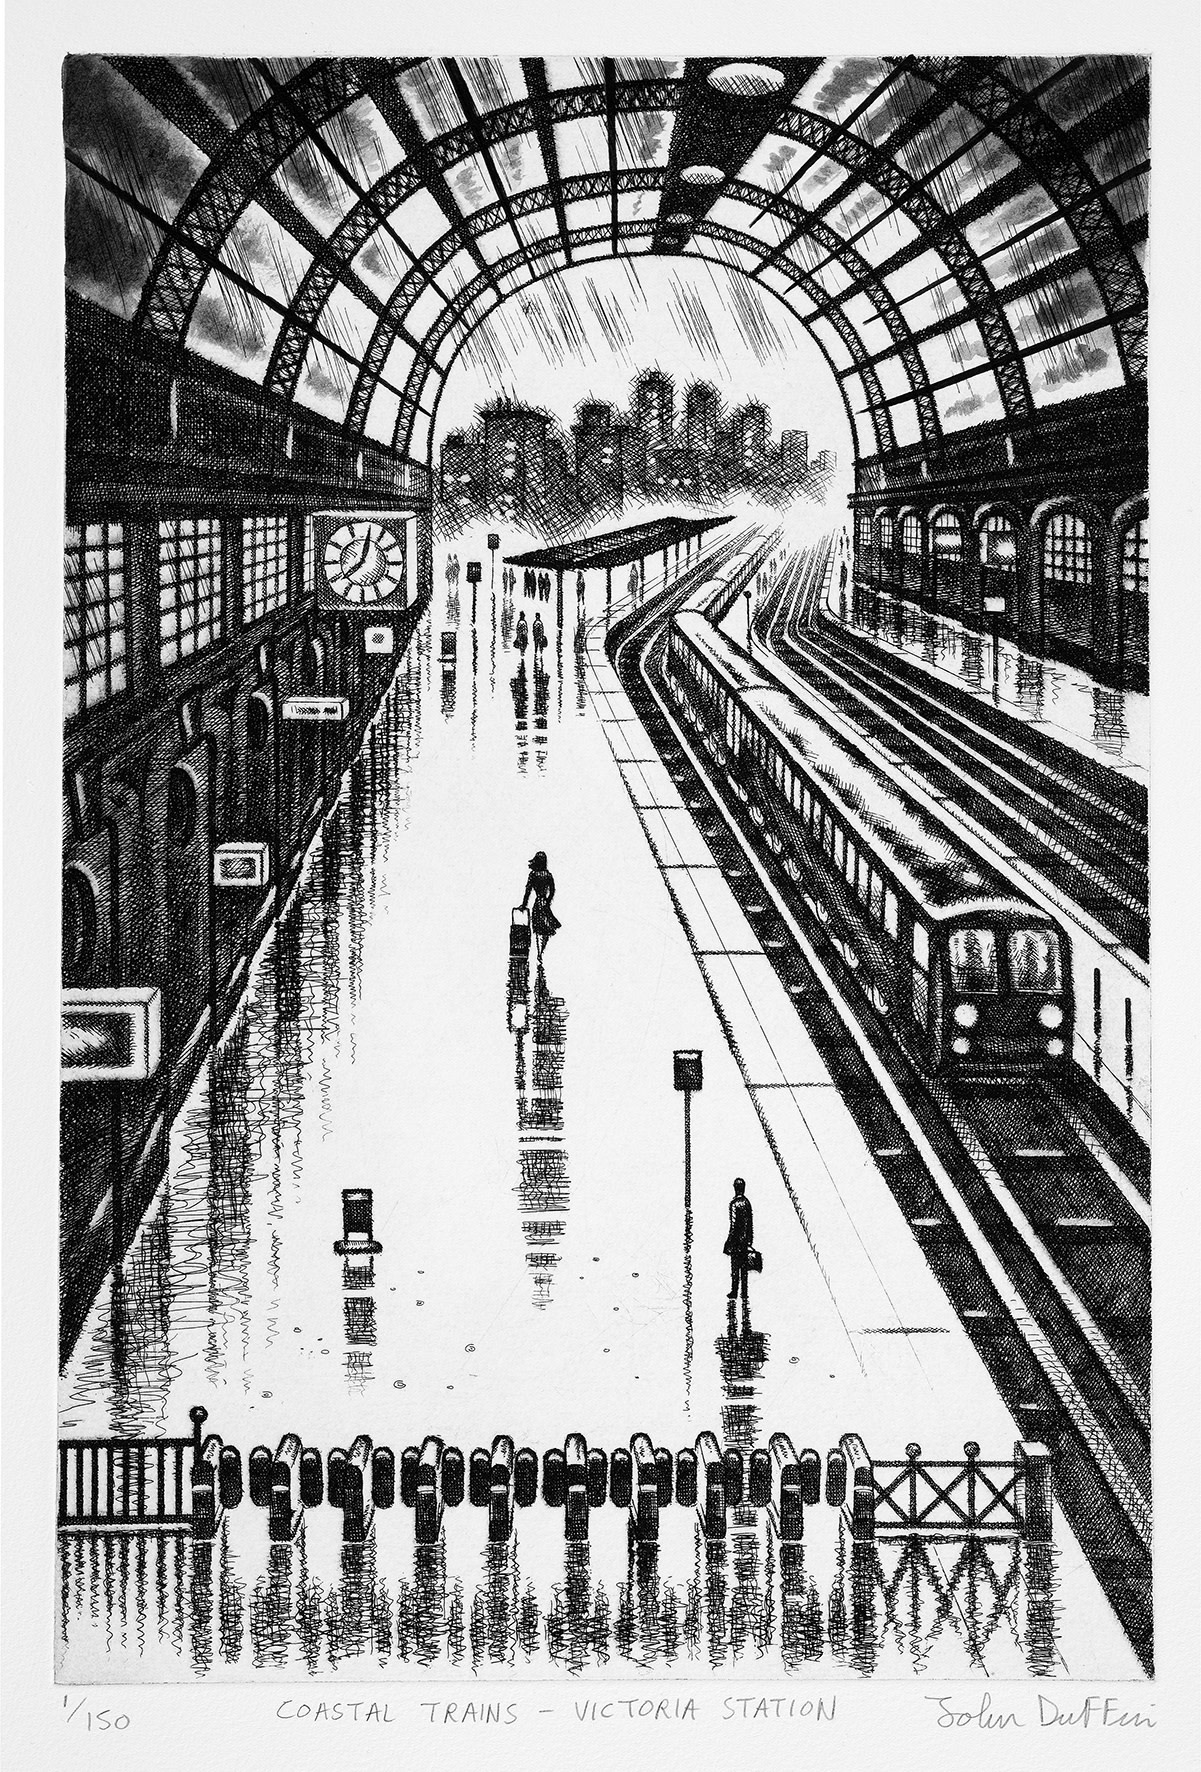 "<span class=""link fancybox-details-link""><a href=""/exhibitions/23/works/artworks_standalone11204/"">View Detail Page</a></span><div class=""artist""><span class=""artist""><strong>John Duffin RE</strong></span></div><div class=""title""><em>Coastal Trains - Victoria Station</em></div><div class=""medium"">etching</div><div class=""dimensions"">50 x 50cm paper size<br>38 x 25cm image size</div><div class=""edition_details"">edition of 150</div>"